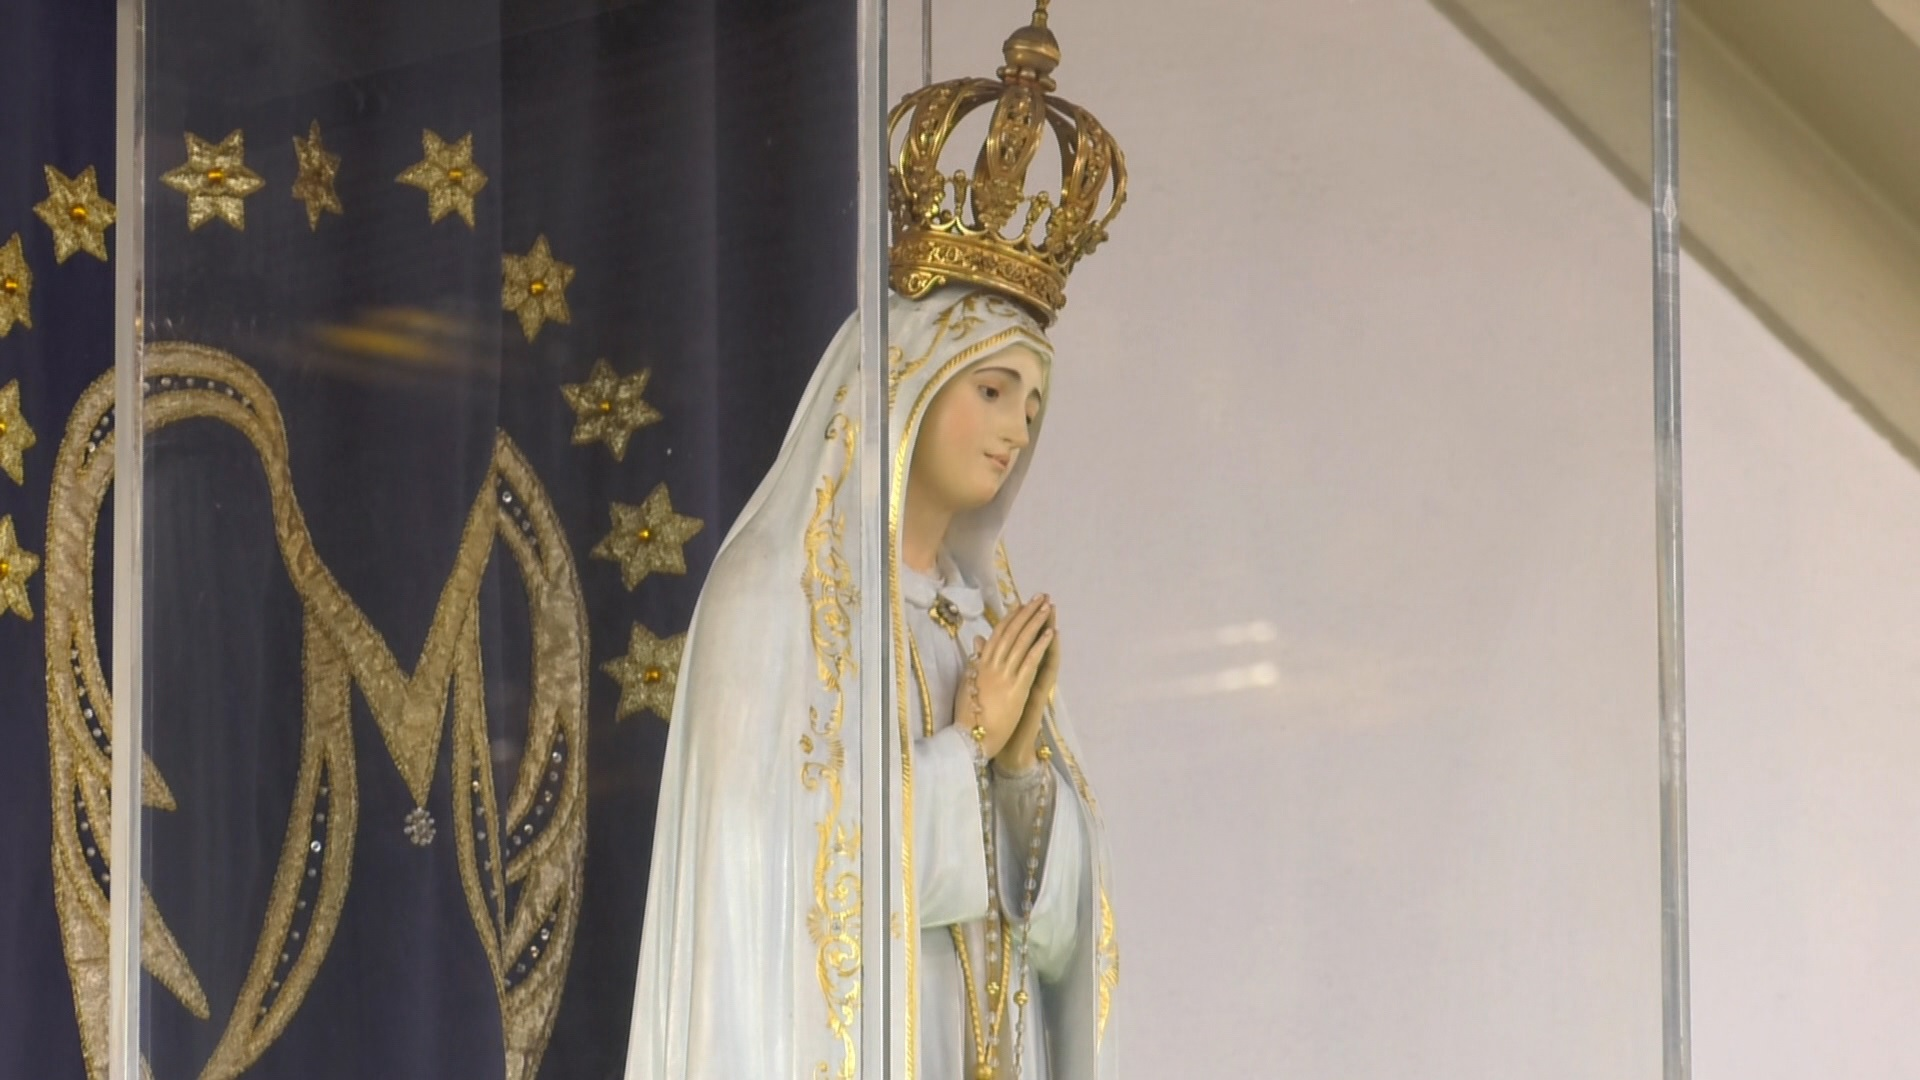 Posvetna molitva Gospi Fatimskoj o stotoj obljetnici ukazanja